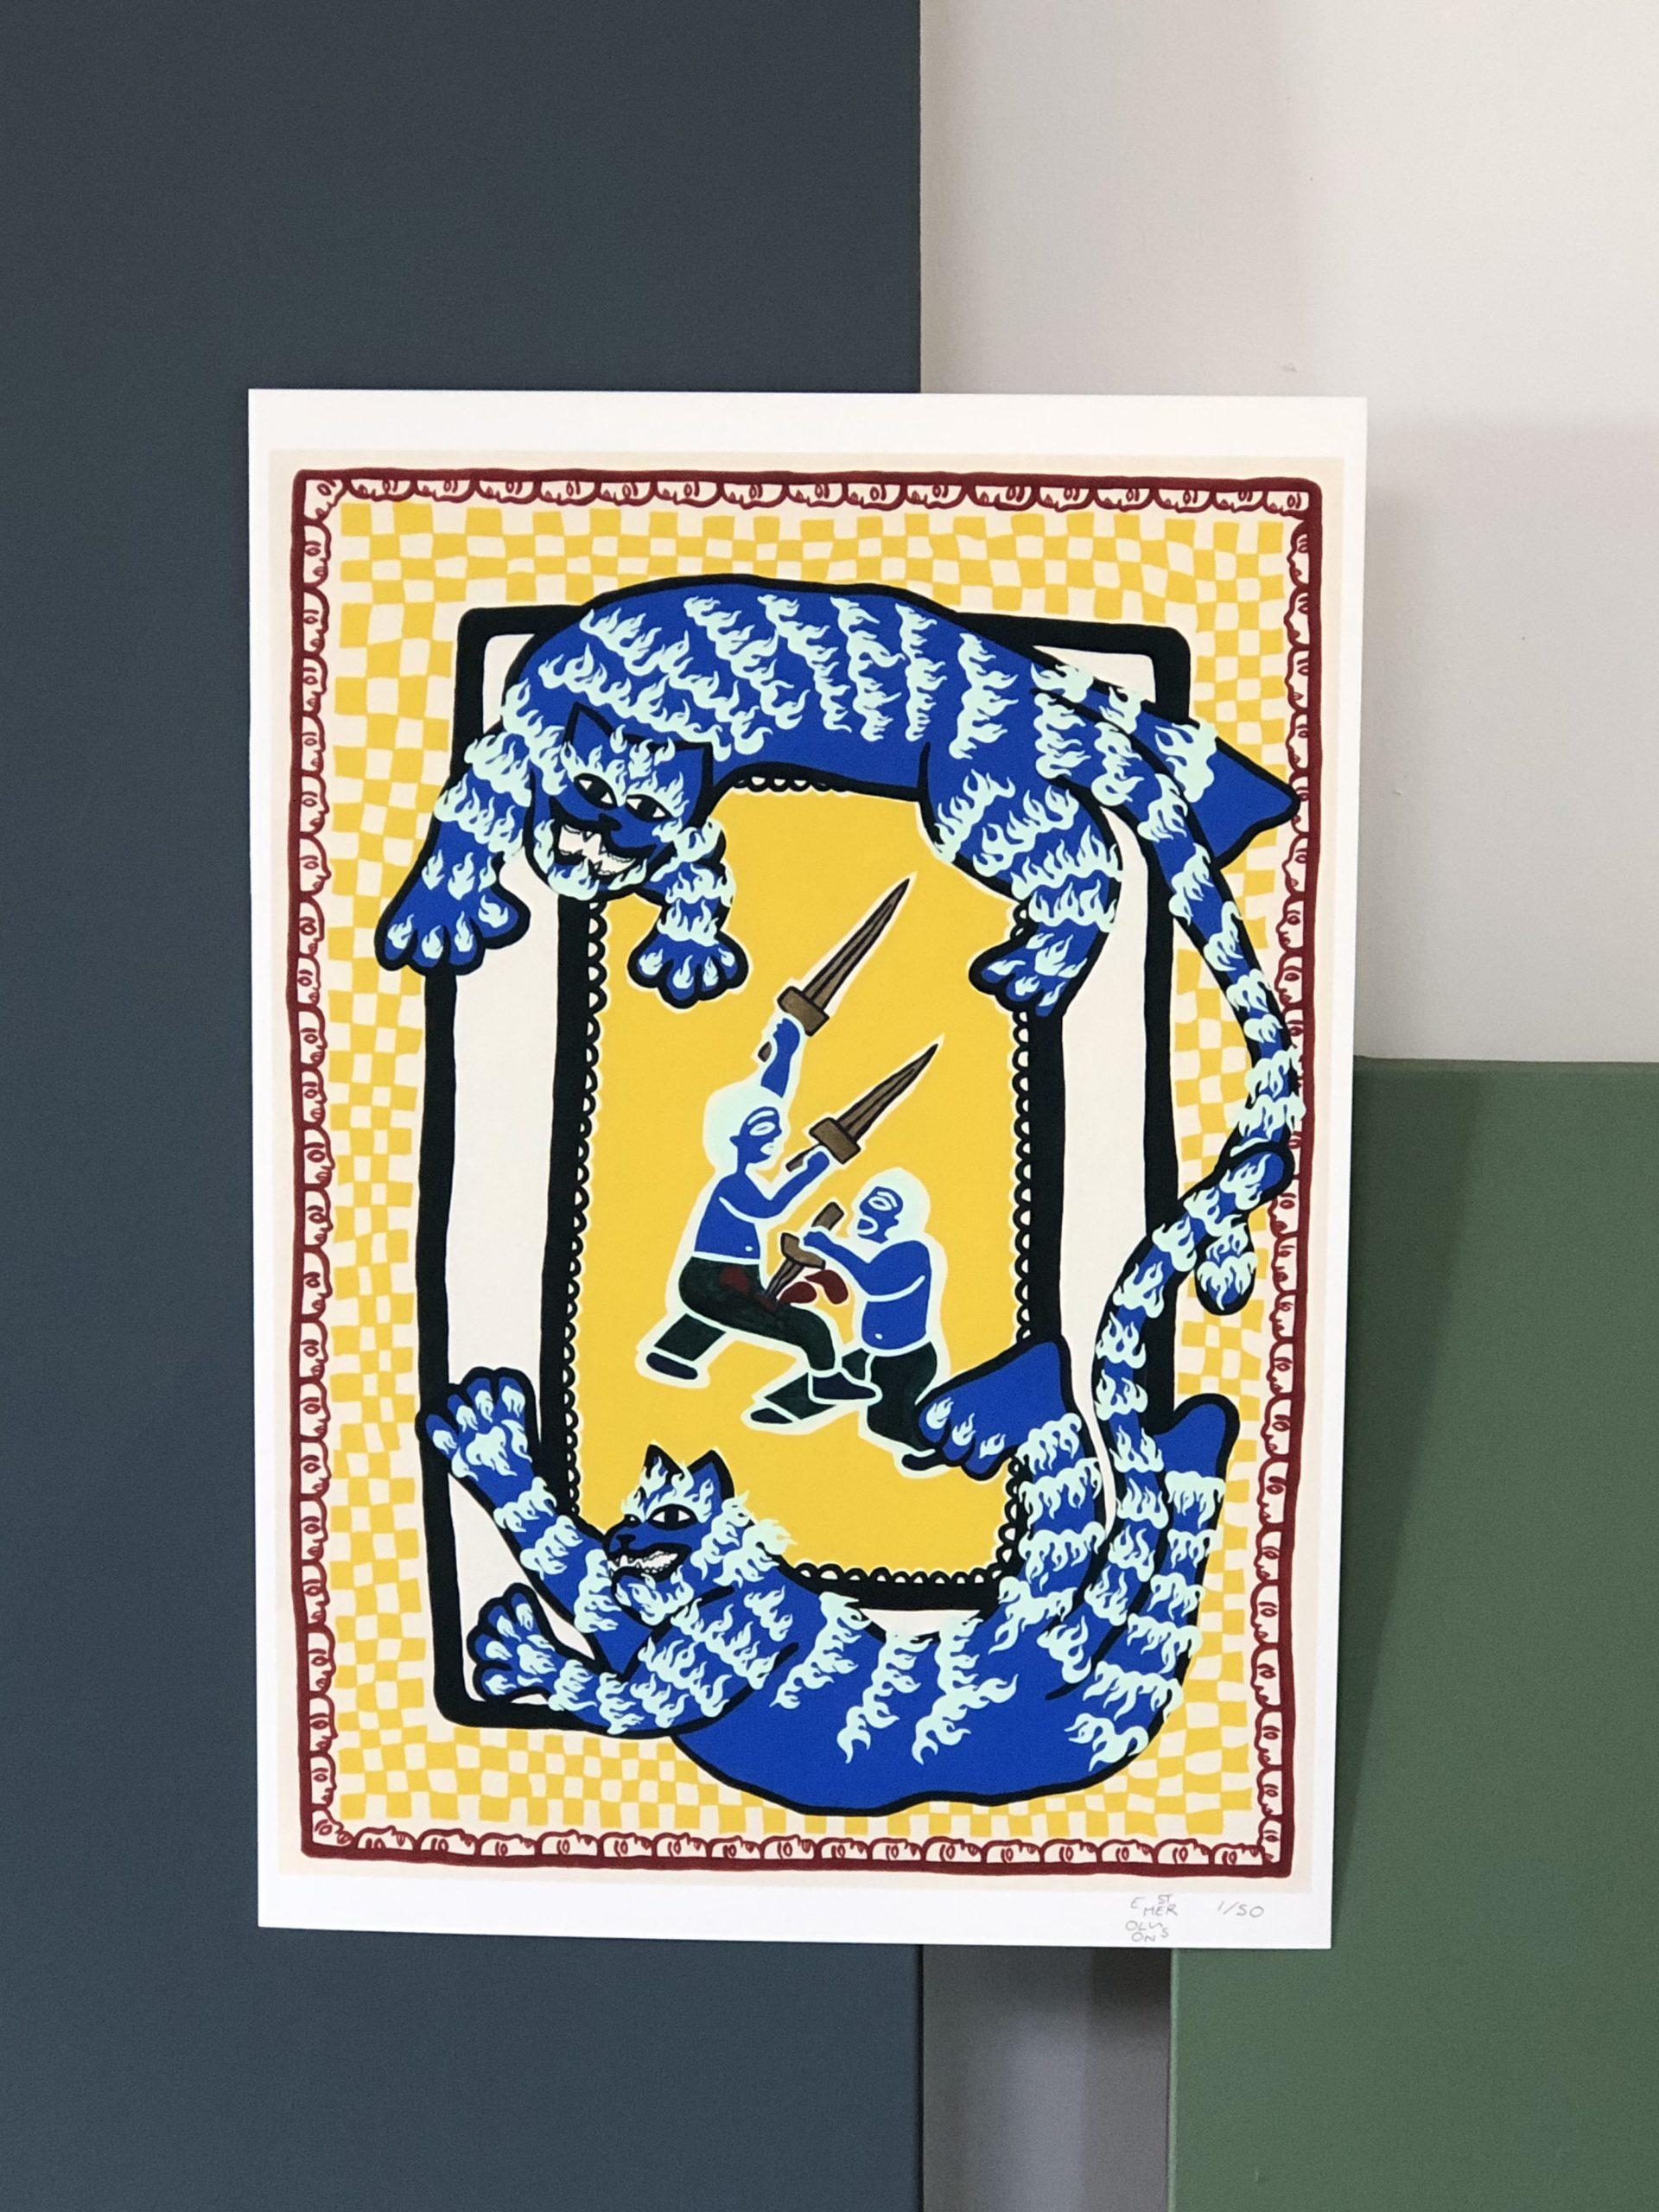 powerful tiger rug, fine art print